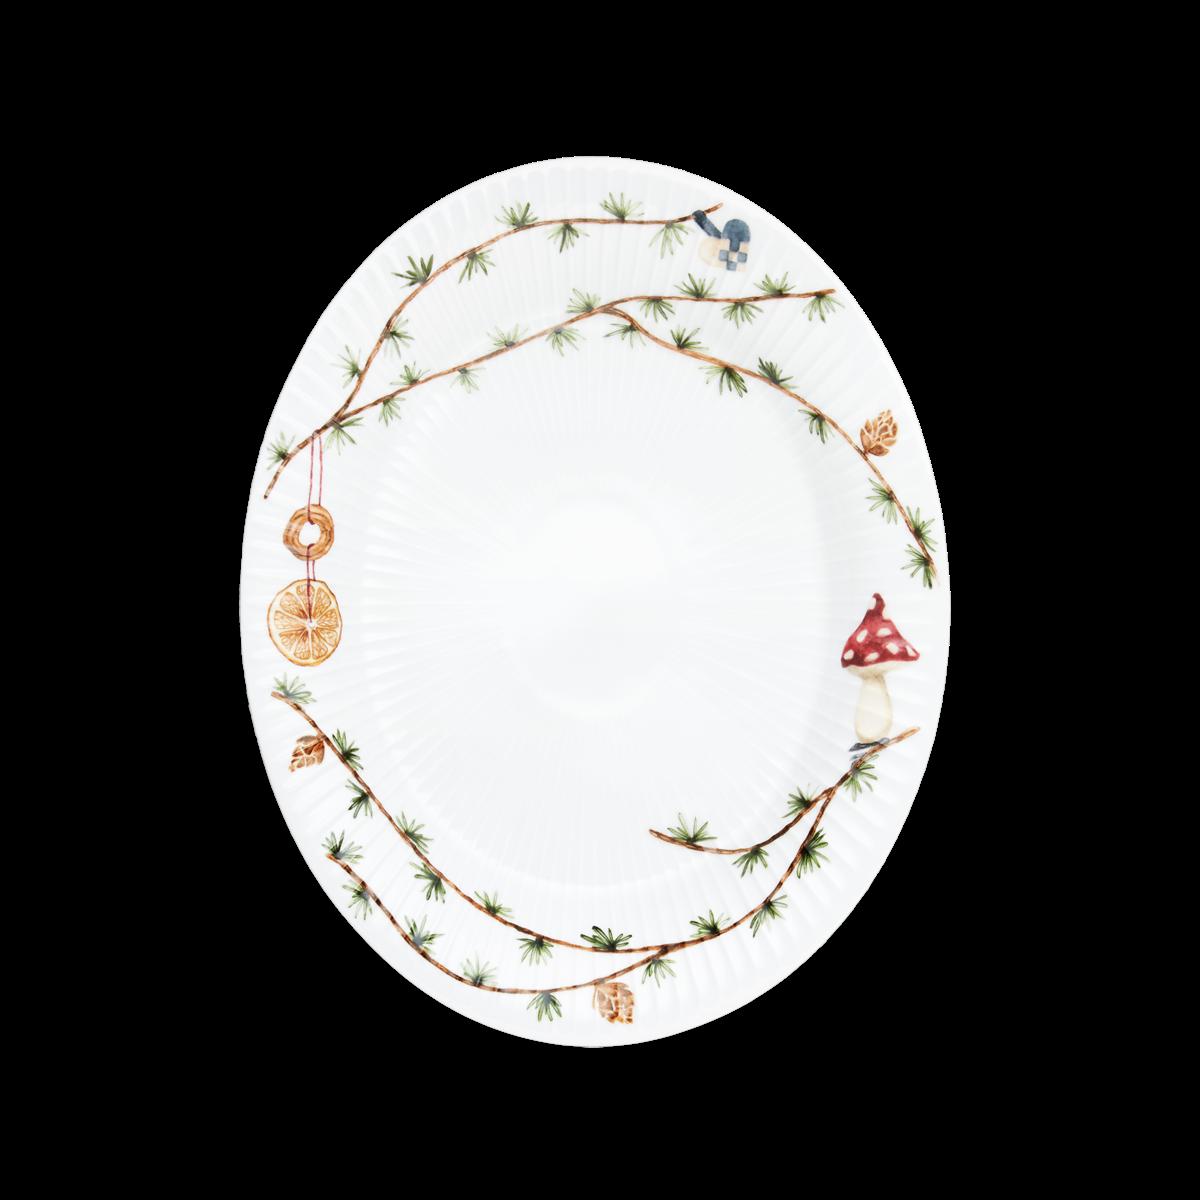 Kähler - Hammershøi Christmas Ovalt Table Dish 2020 Small - White With Deko (690112)